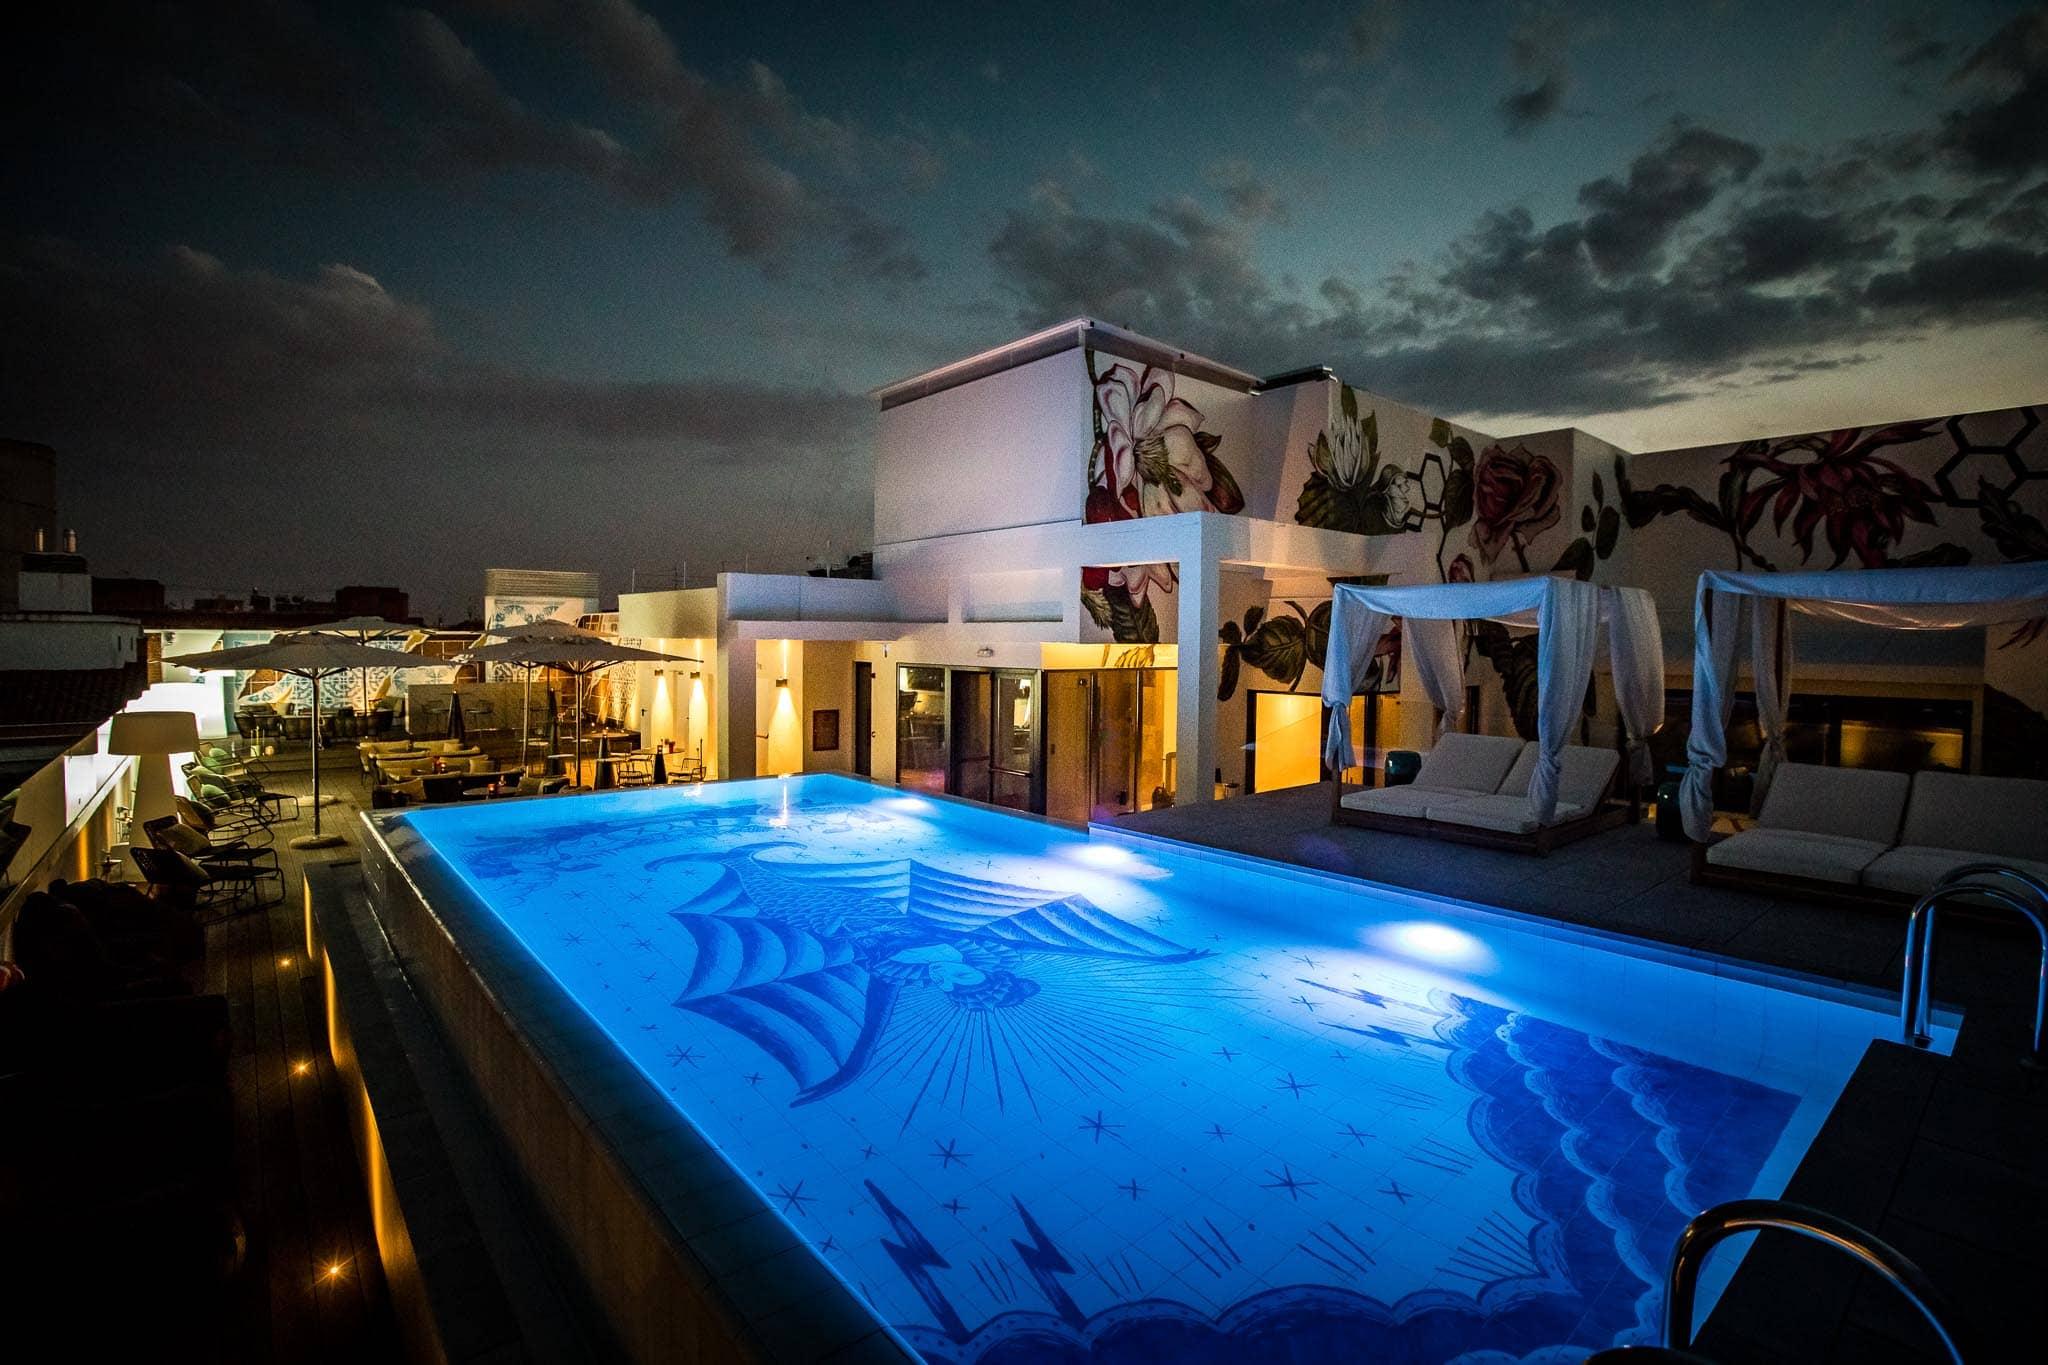 NYX HOTELS pool Sergio Mora